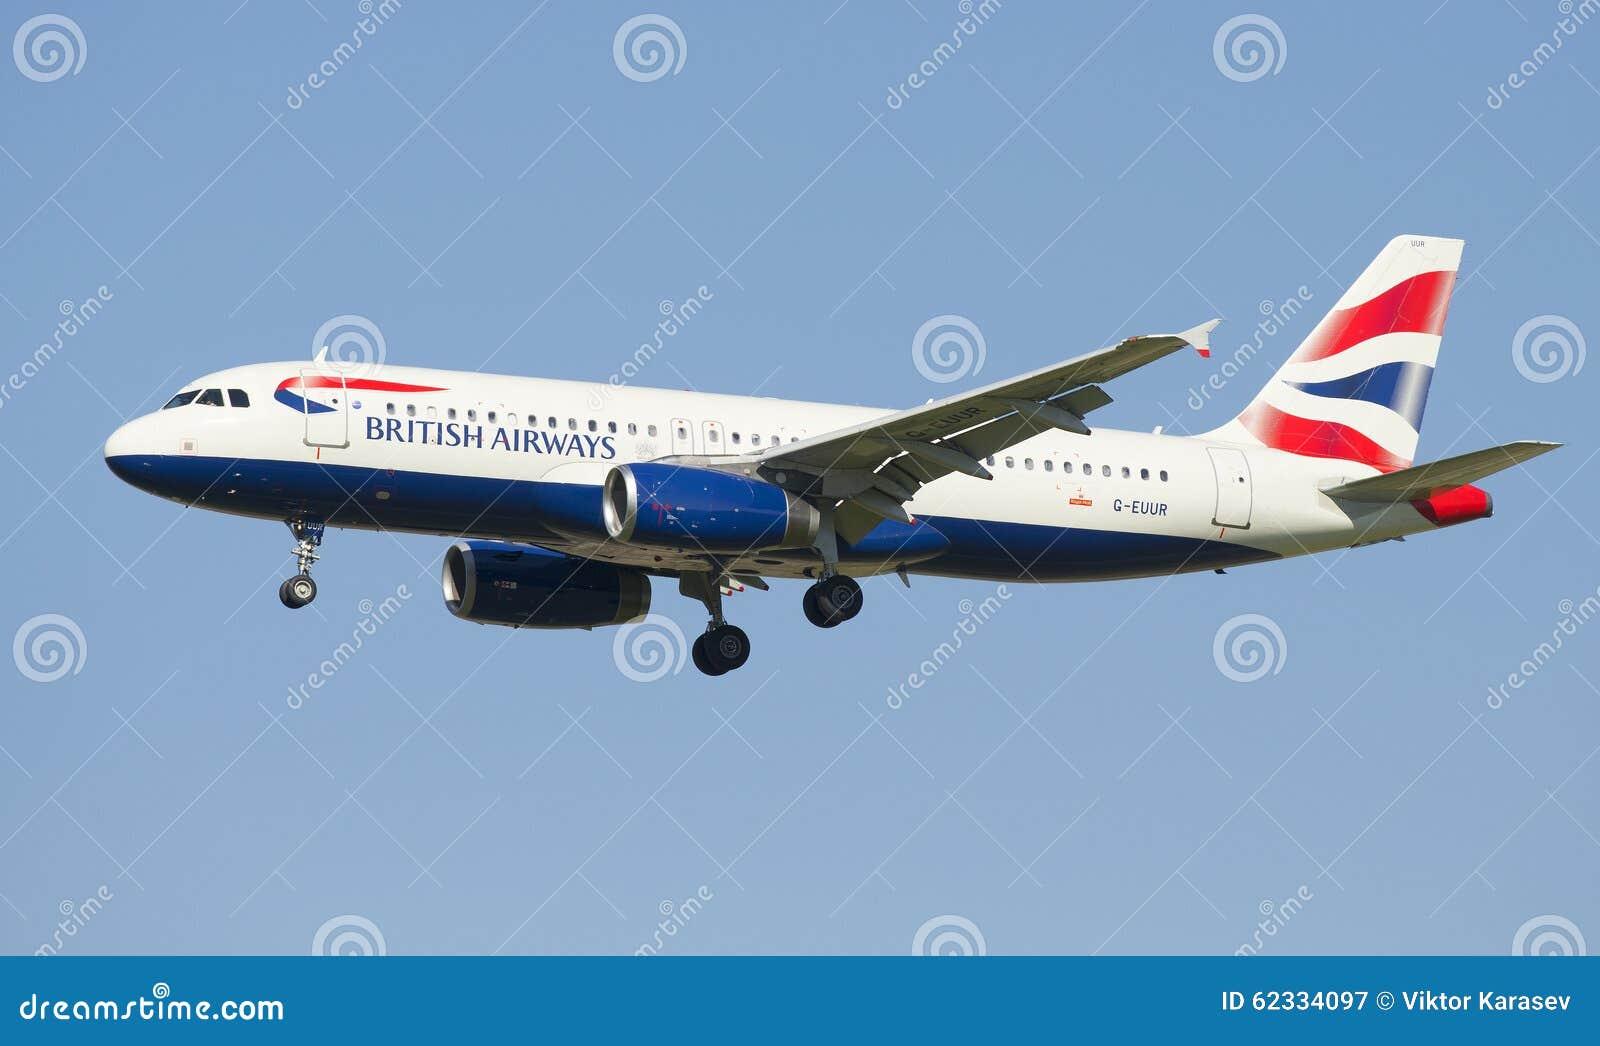 Airbus A320 (γ-EUUR) με τη British Airways πρίν προσγειώνεται στον αερολιμένα Pulkovo